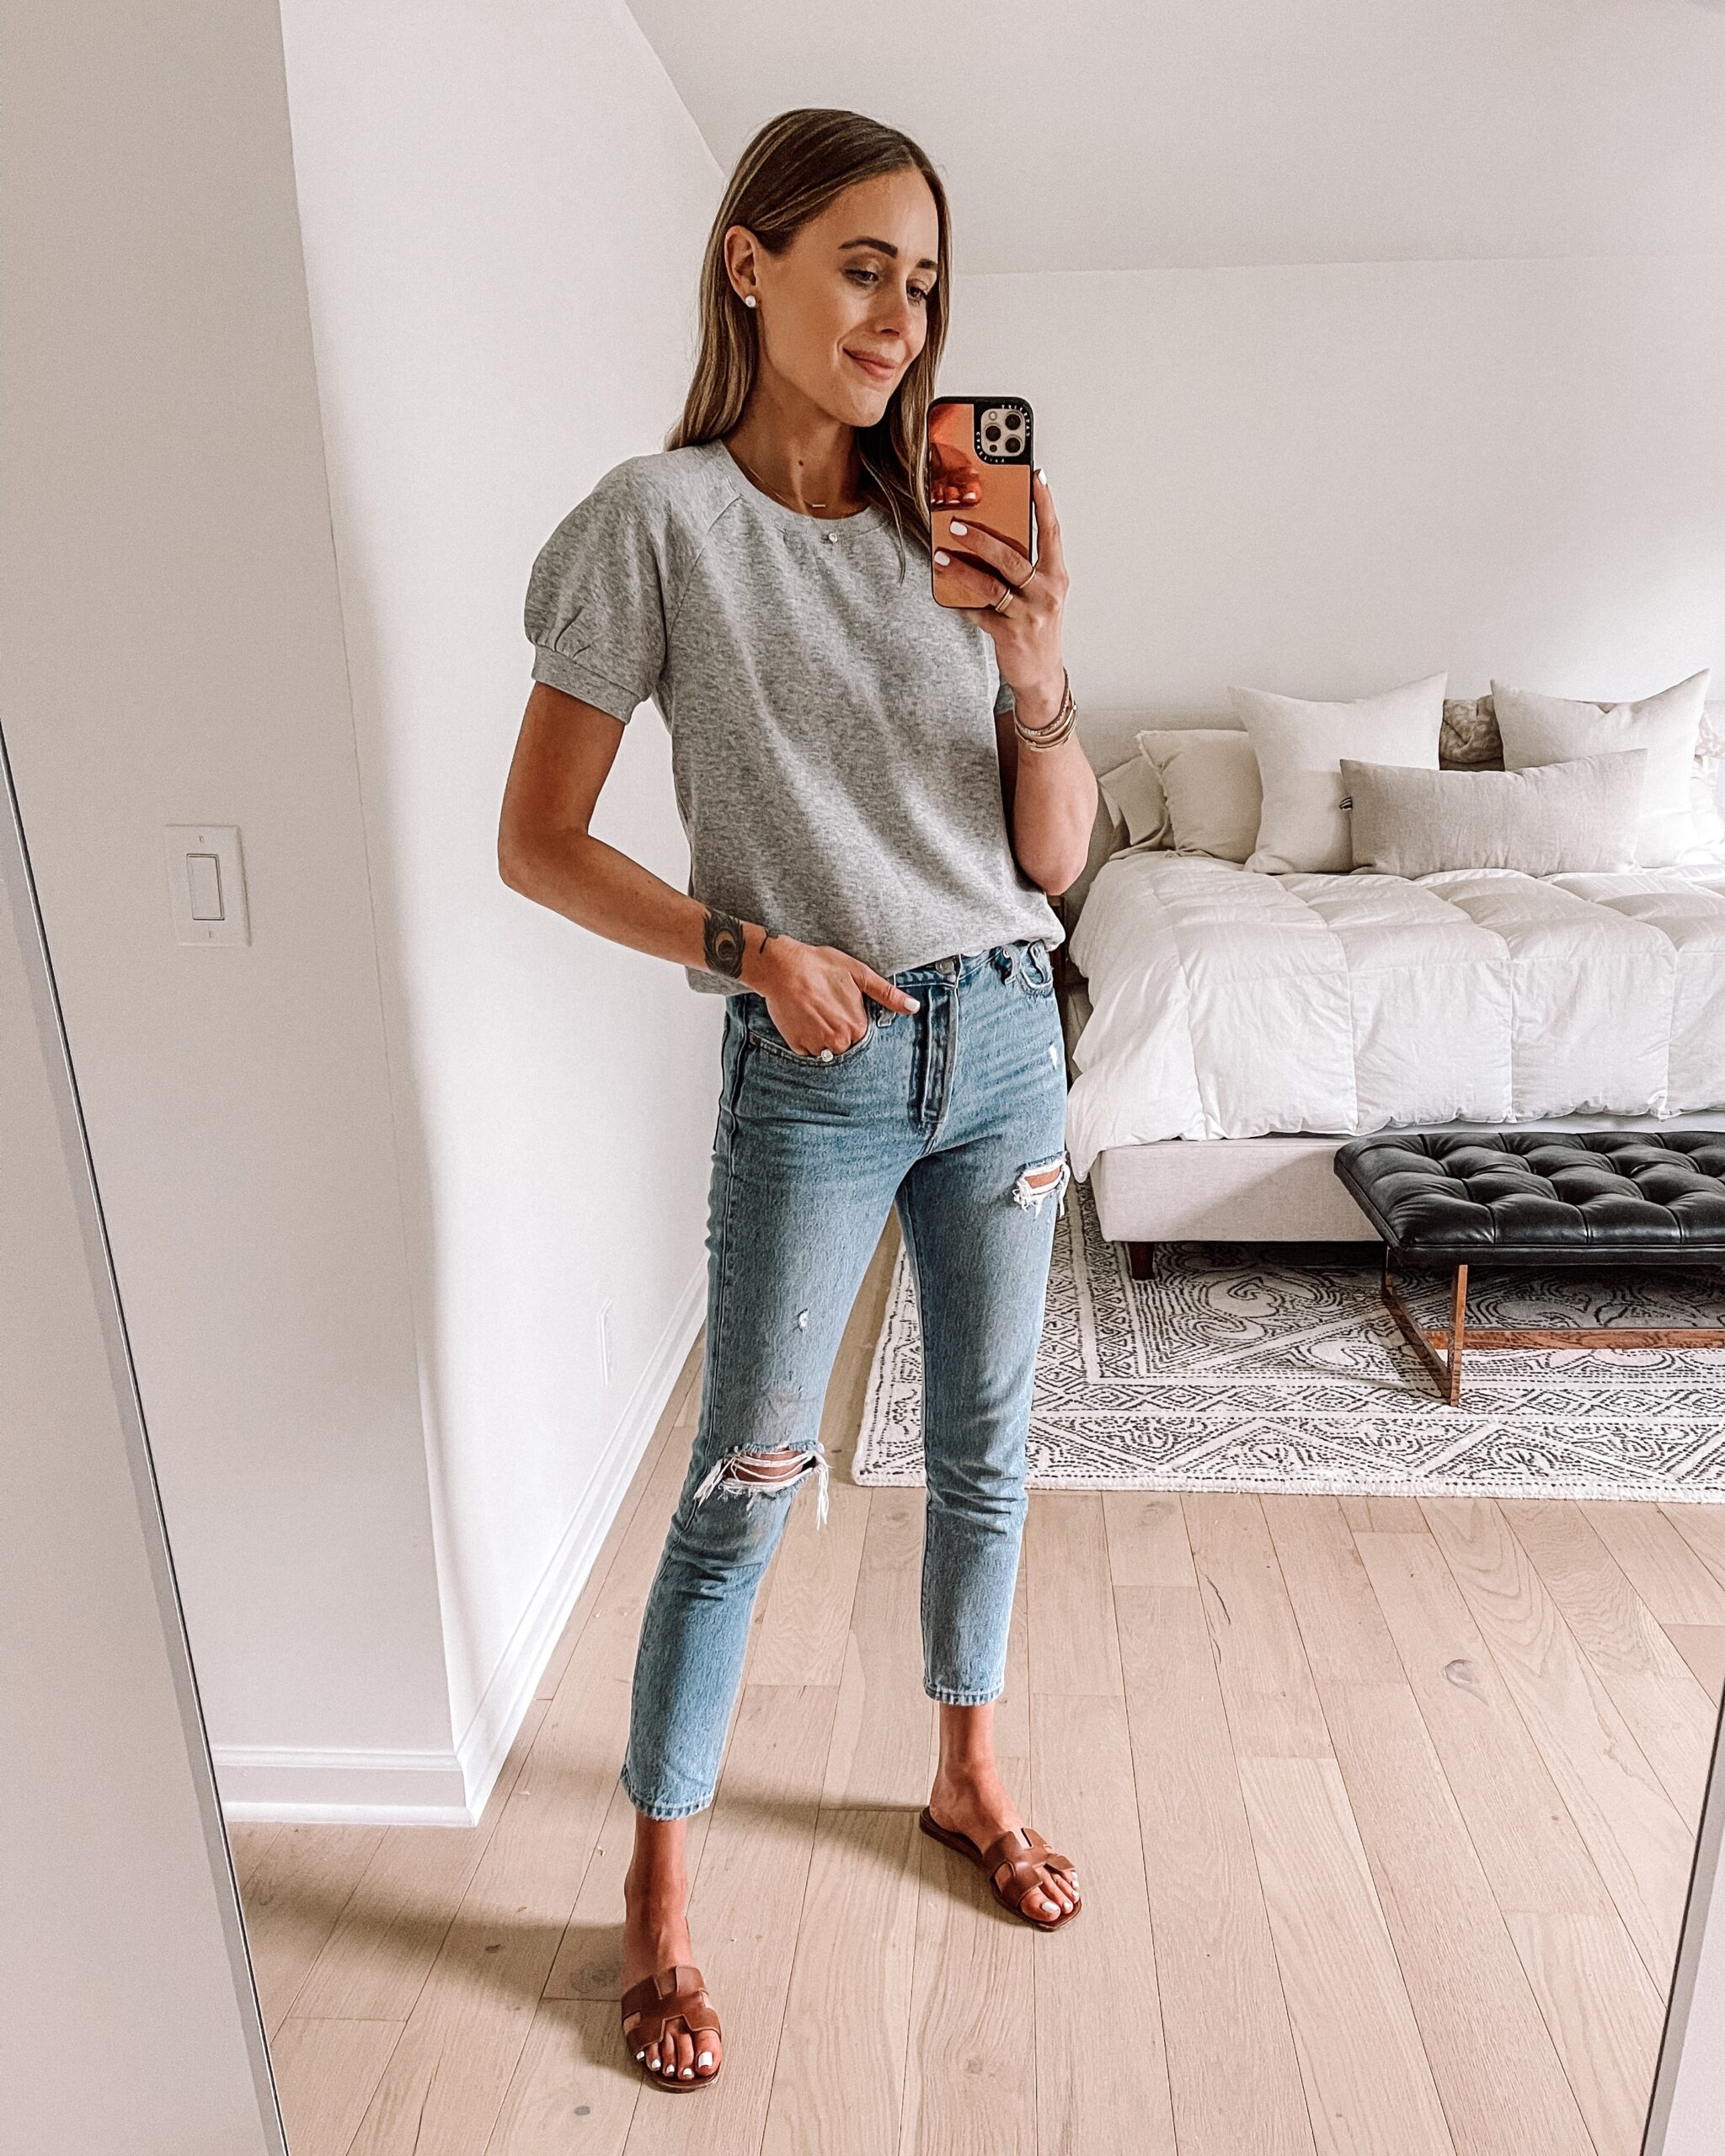 Fashion Jackson Wearing Grey Puff Short Sleeve Sweatshirt Ripped Jeans Tan Sandals